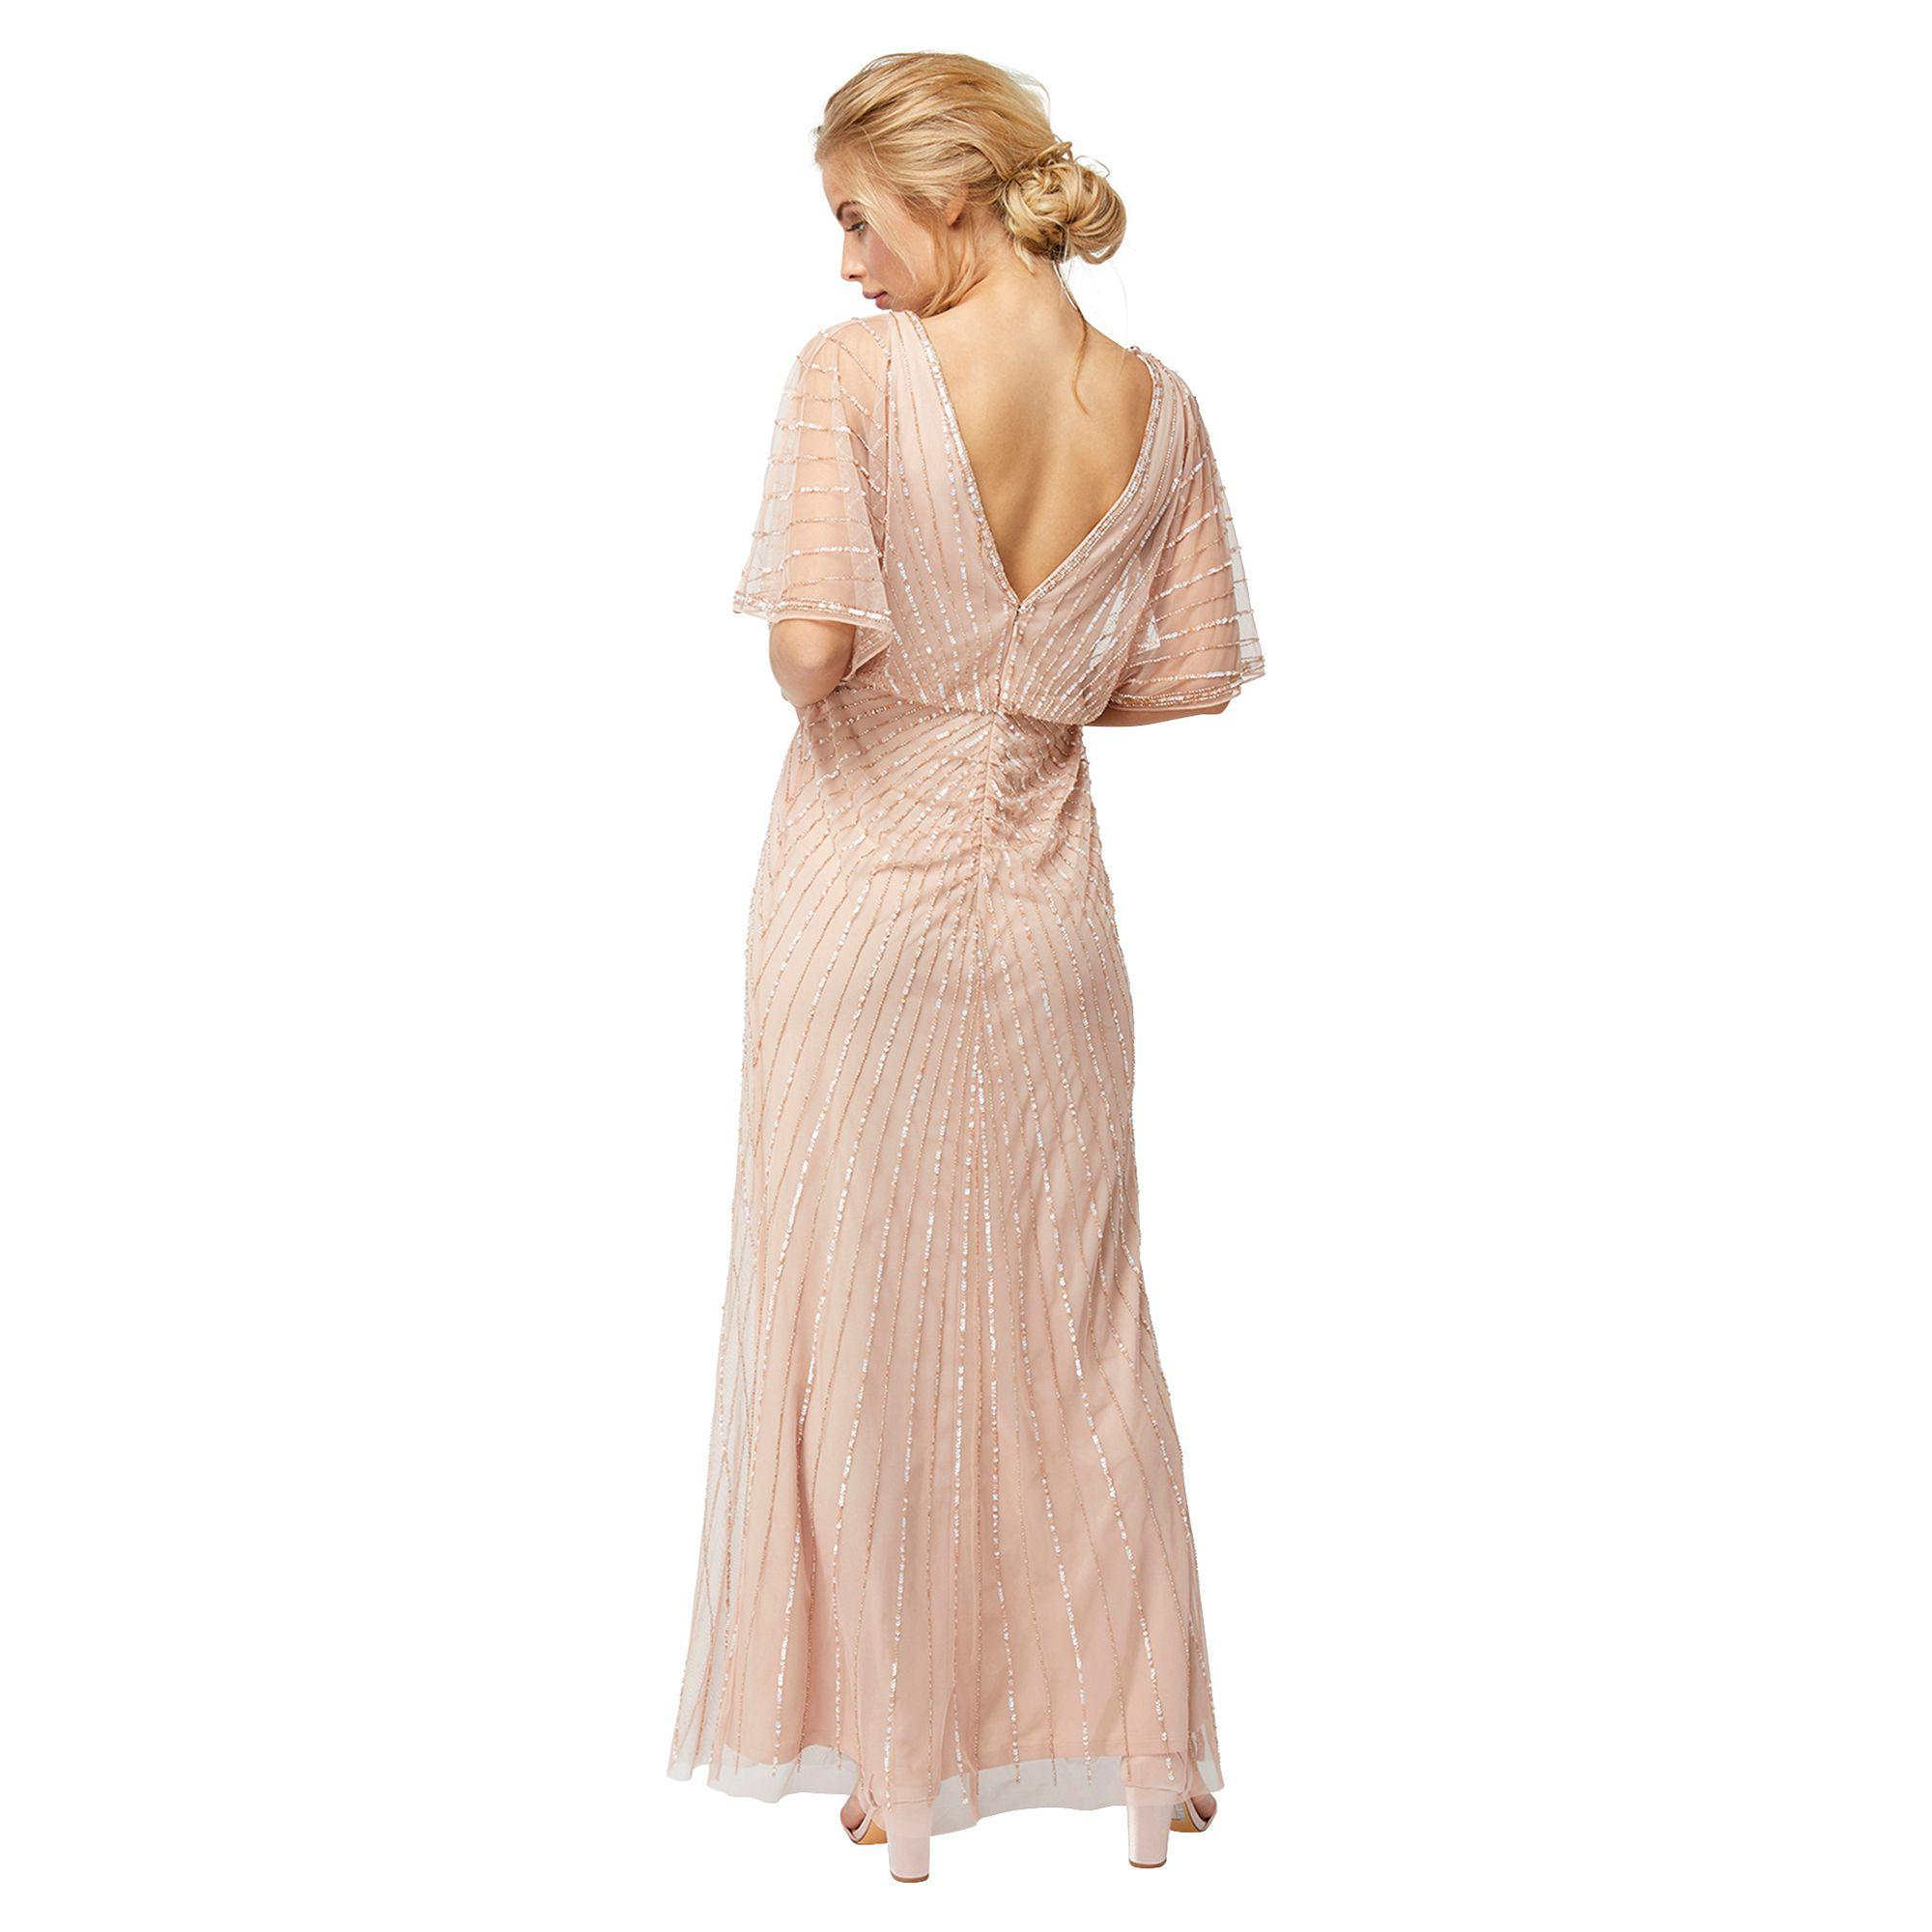 5b29bf839b99 Monsoon Party Maxi Dresses